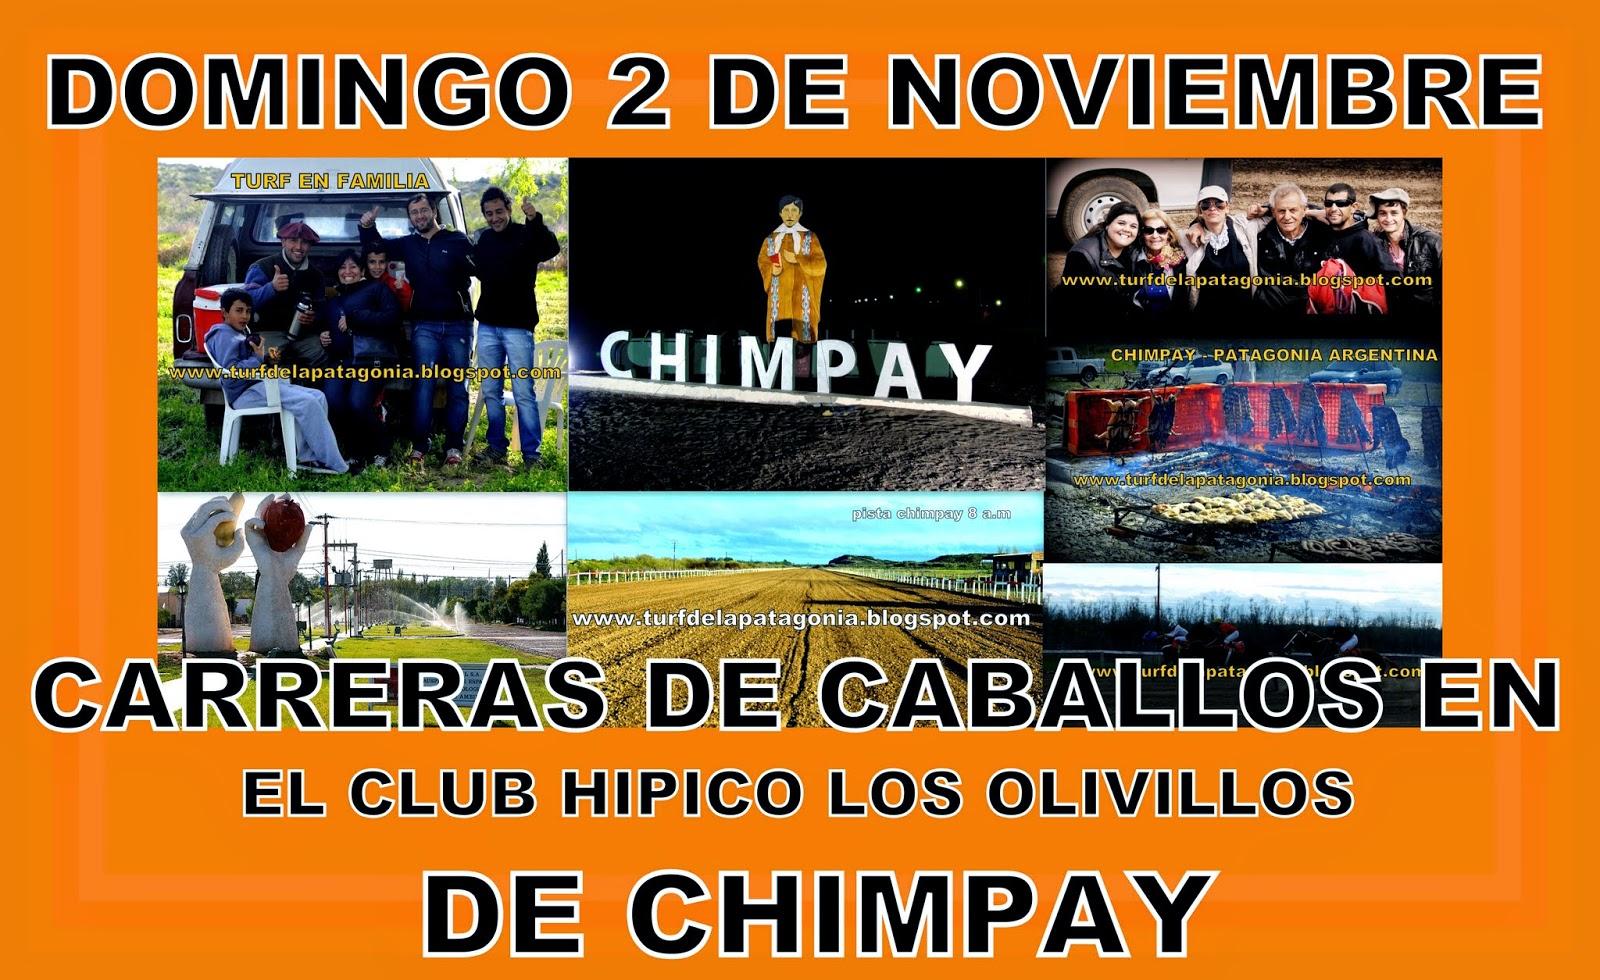 http://turfdelapatagonia.blogspot.com.ar/2014/09/0211-carreras-de-caballos-en-chimpay.html